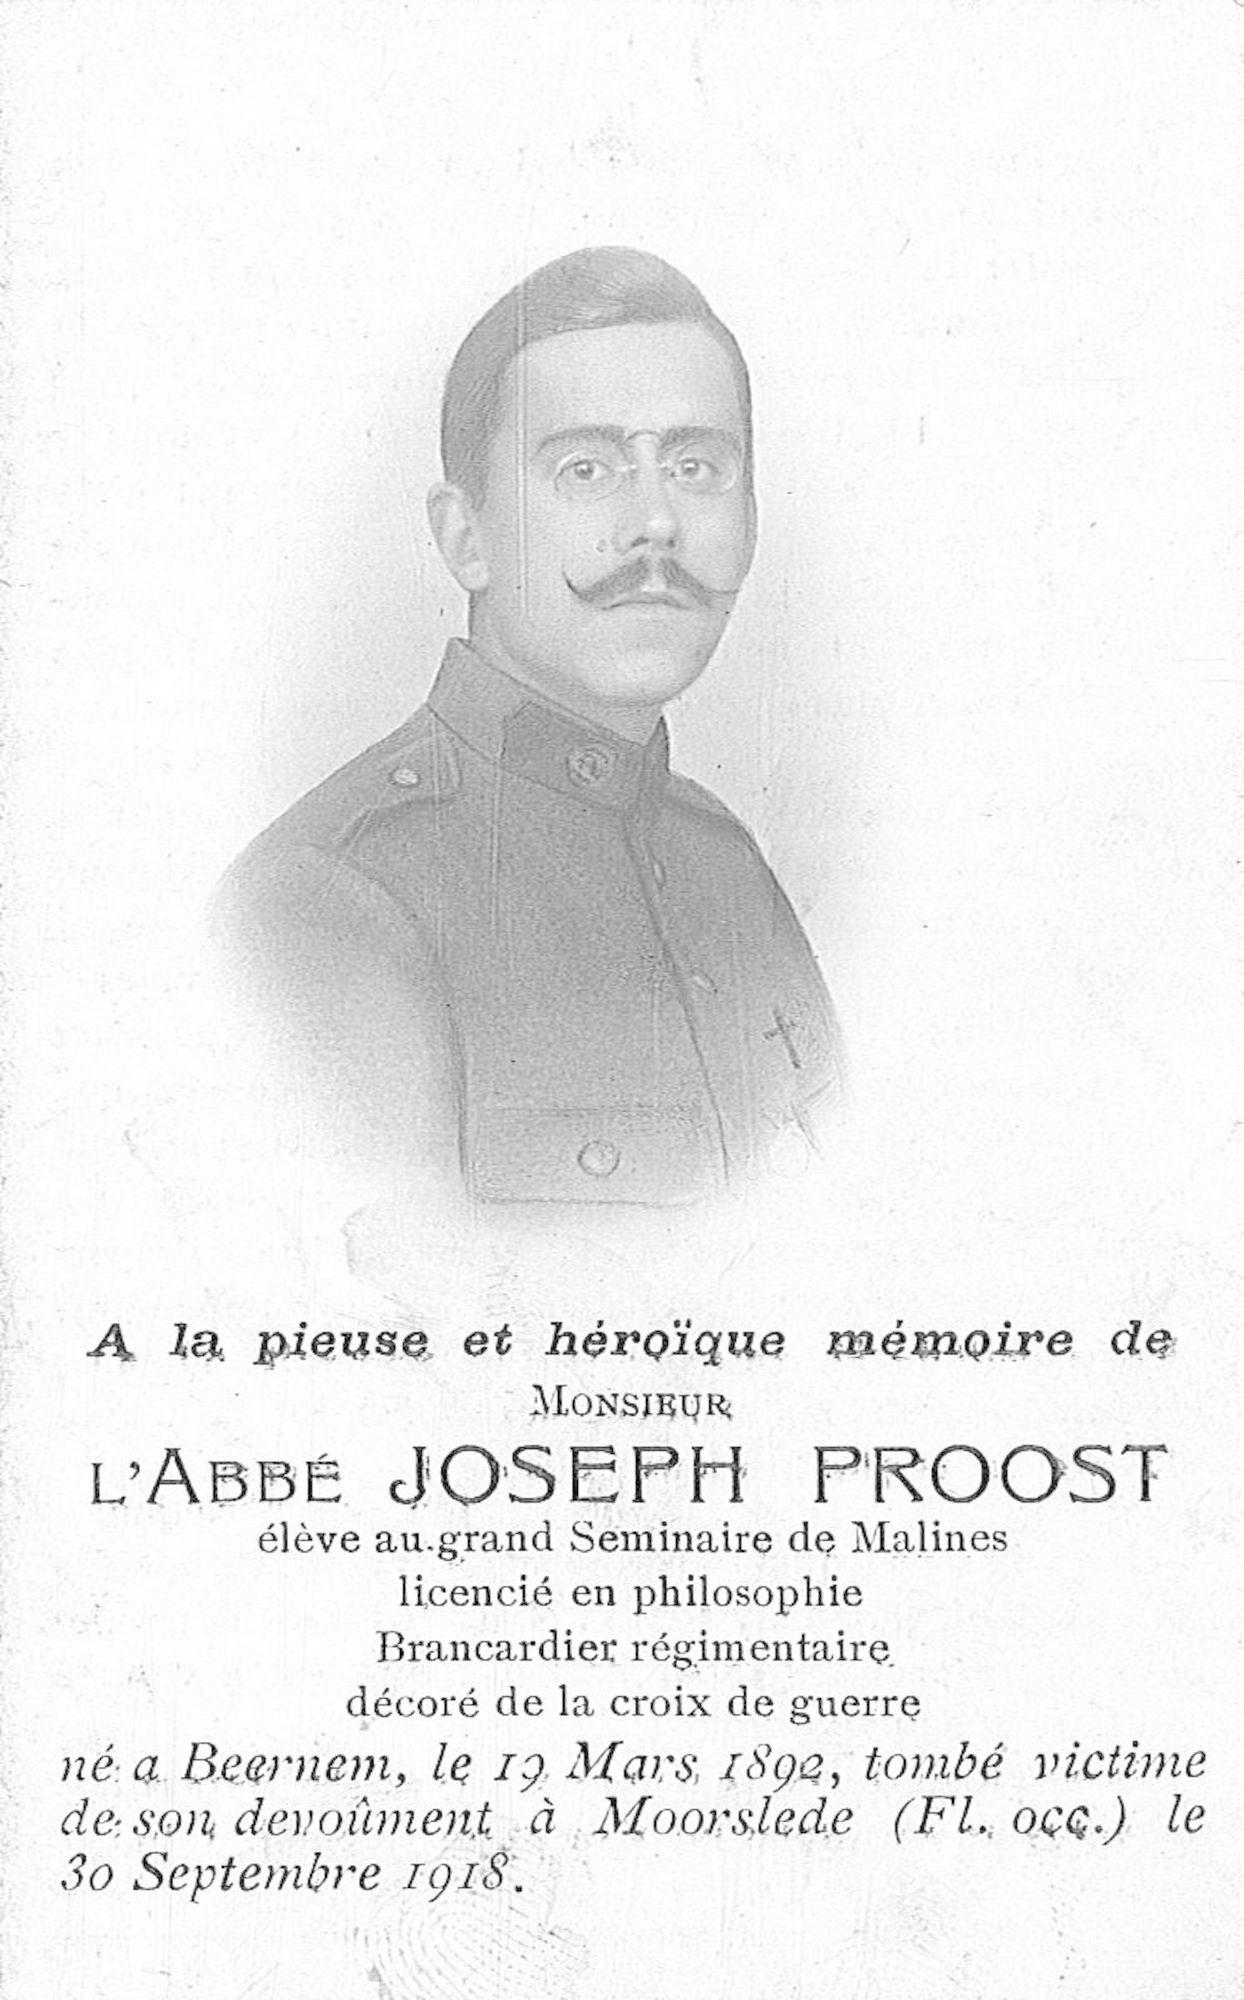 Joseph Proost